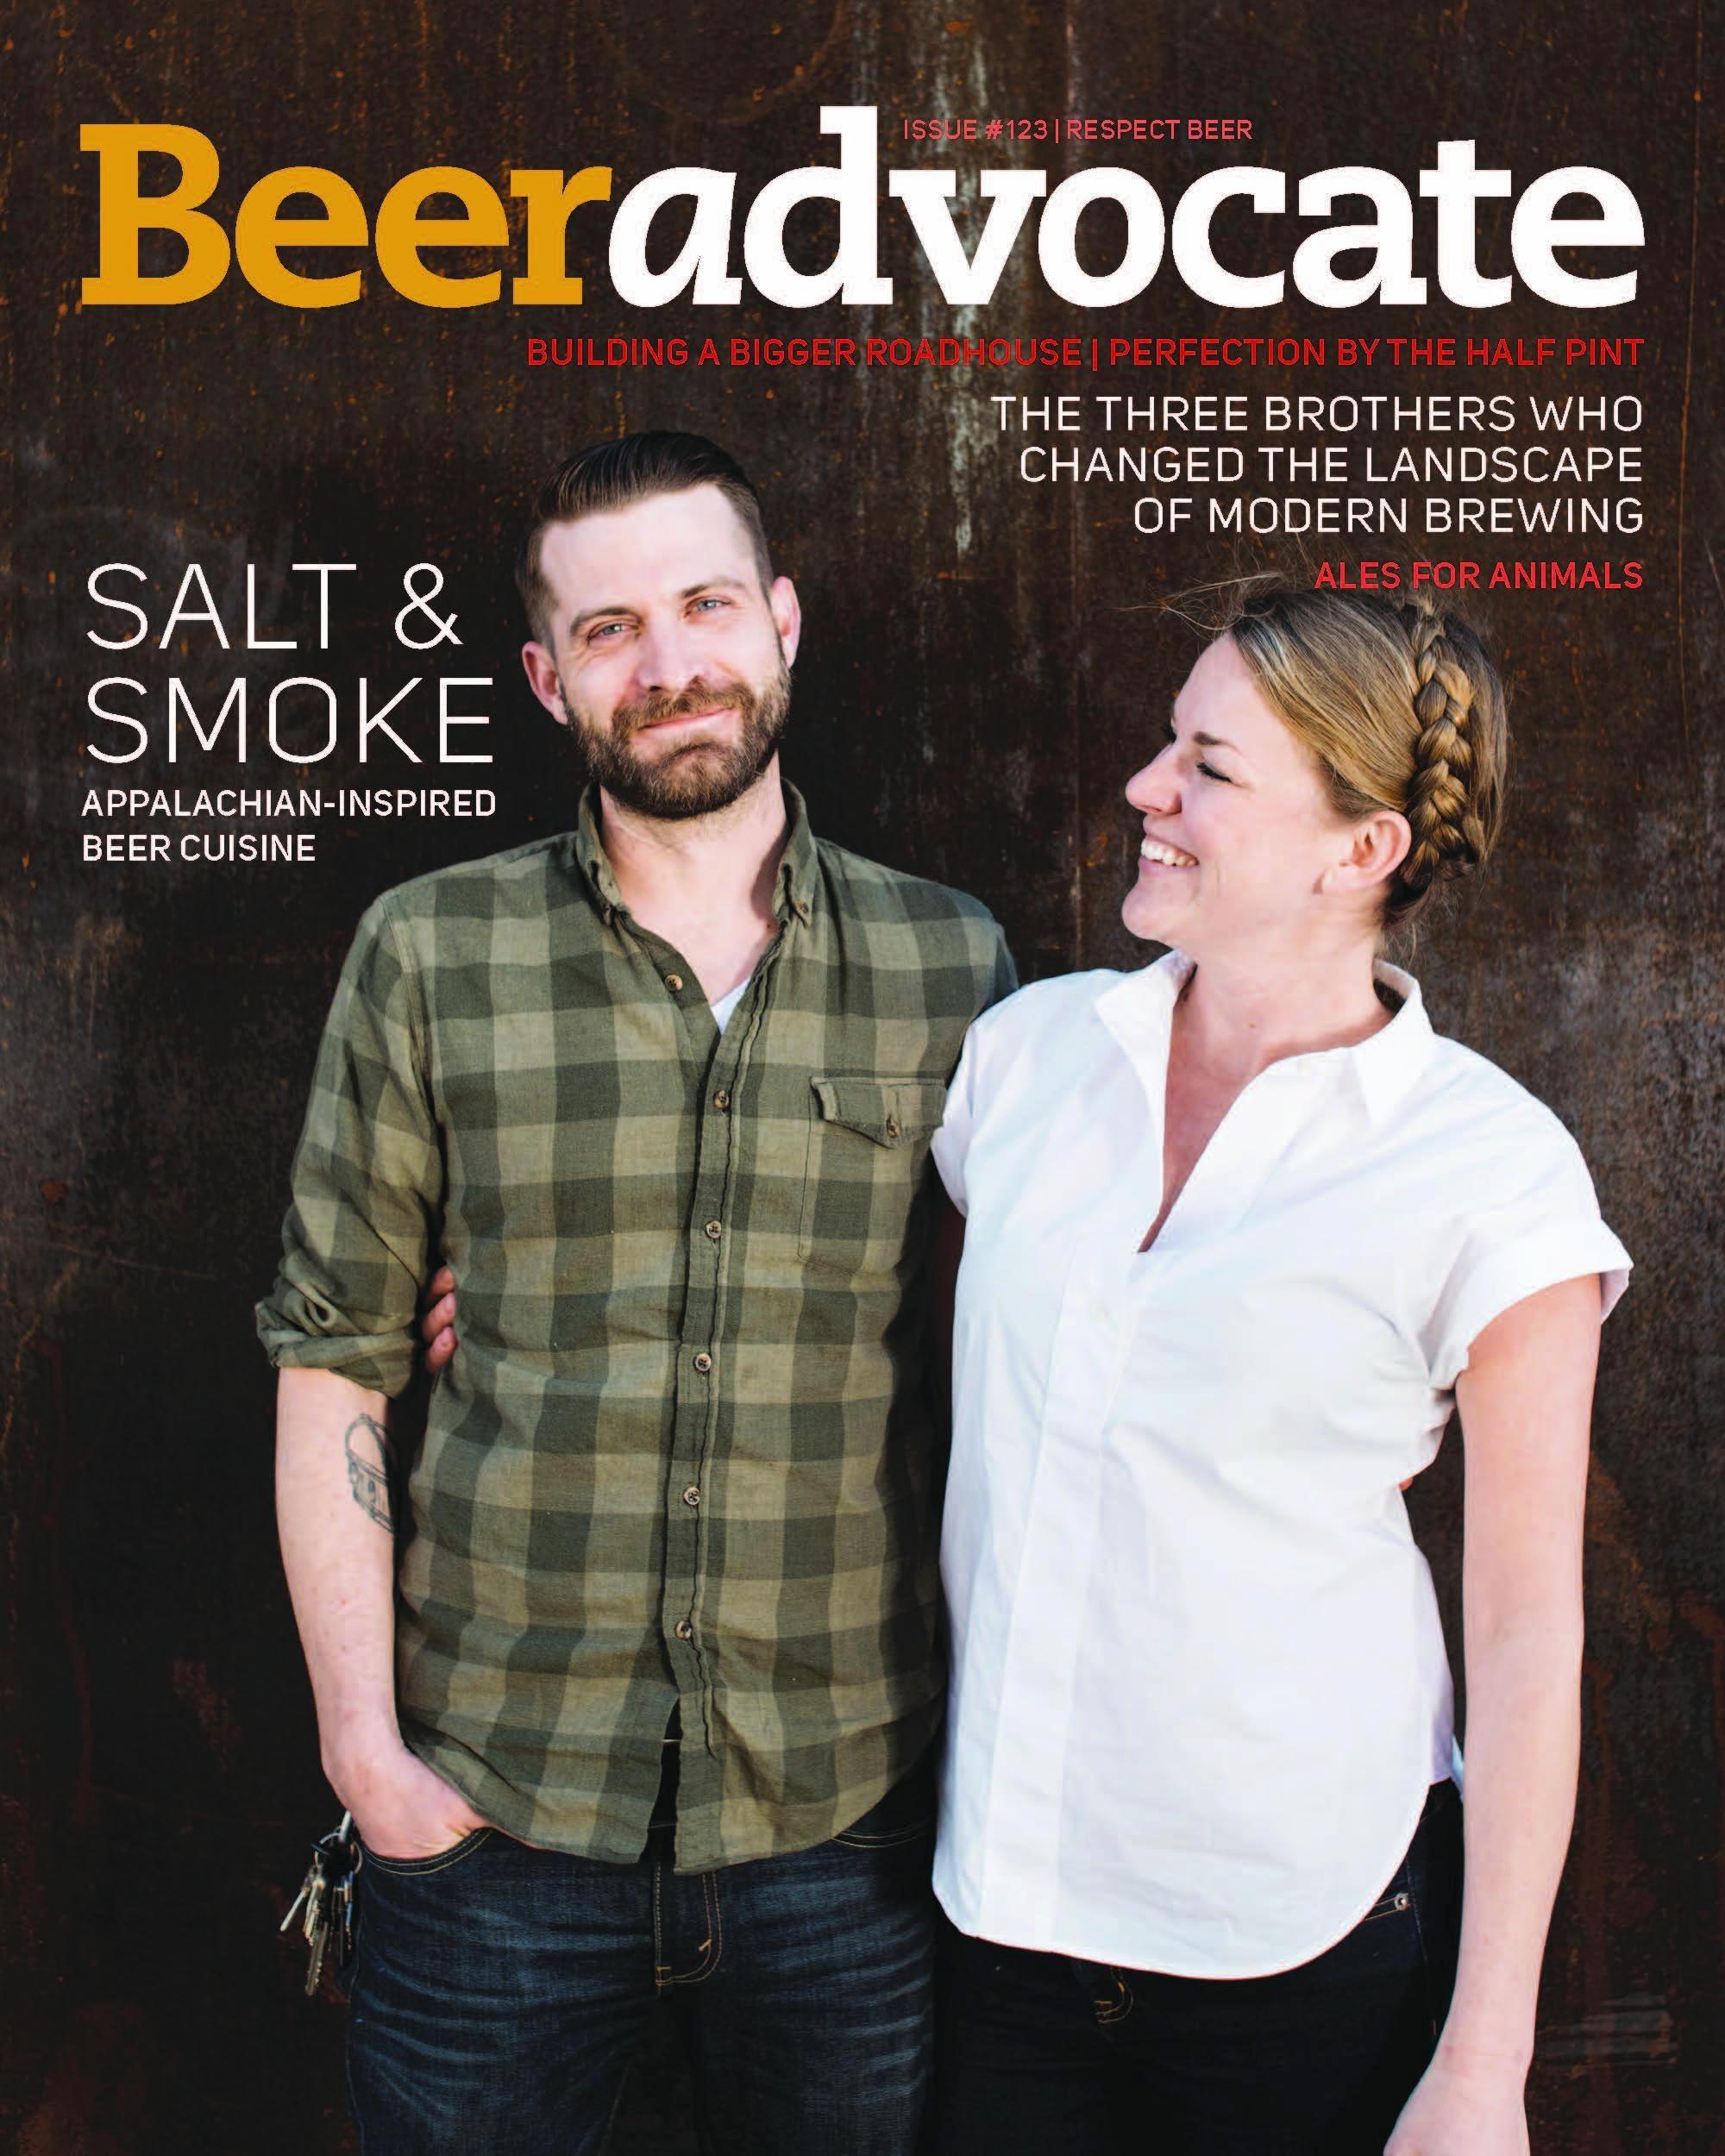 beer advocate jack sorokin cover photo editorial salt and smoke asheville burial beer